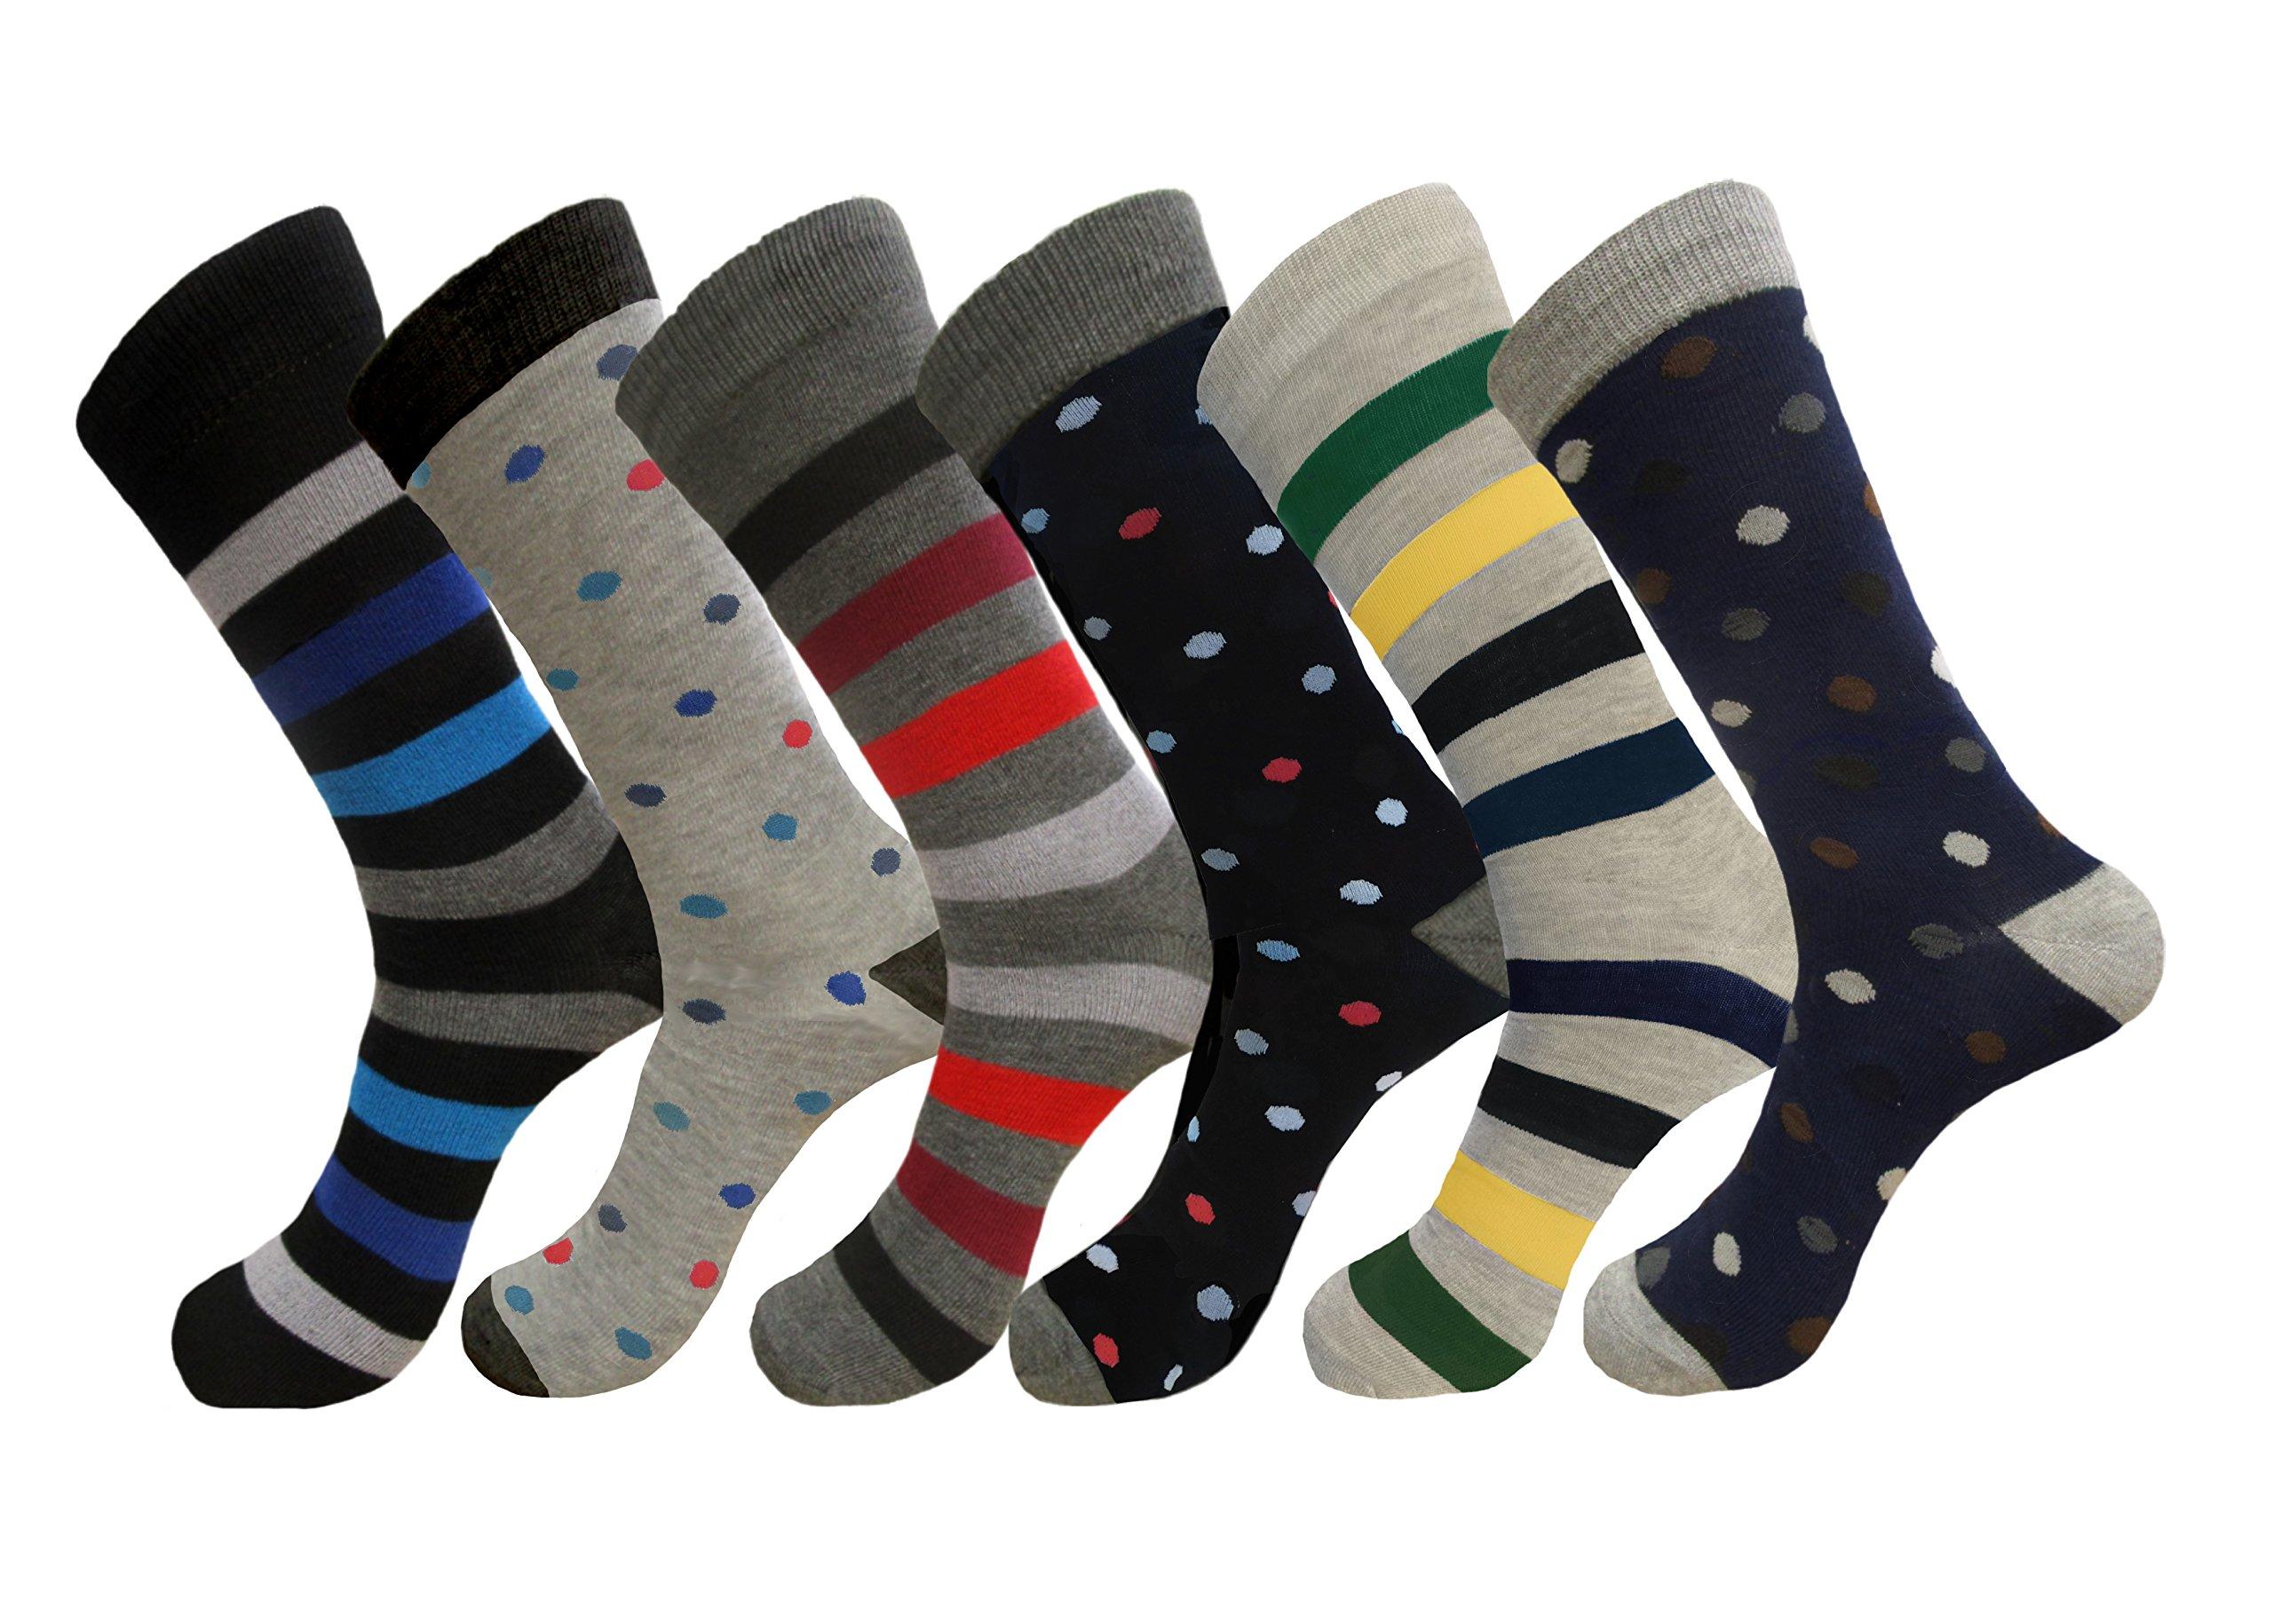 Mens MIX DESIGN FORMAL DRESS SOCKS COTTON BLEND 6 PAIRS SOCKS SIZE 10-13 ( (Assorted)